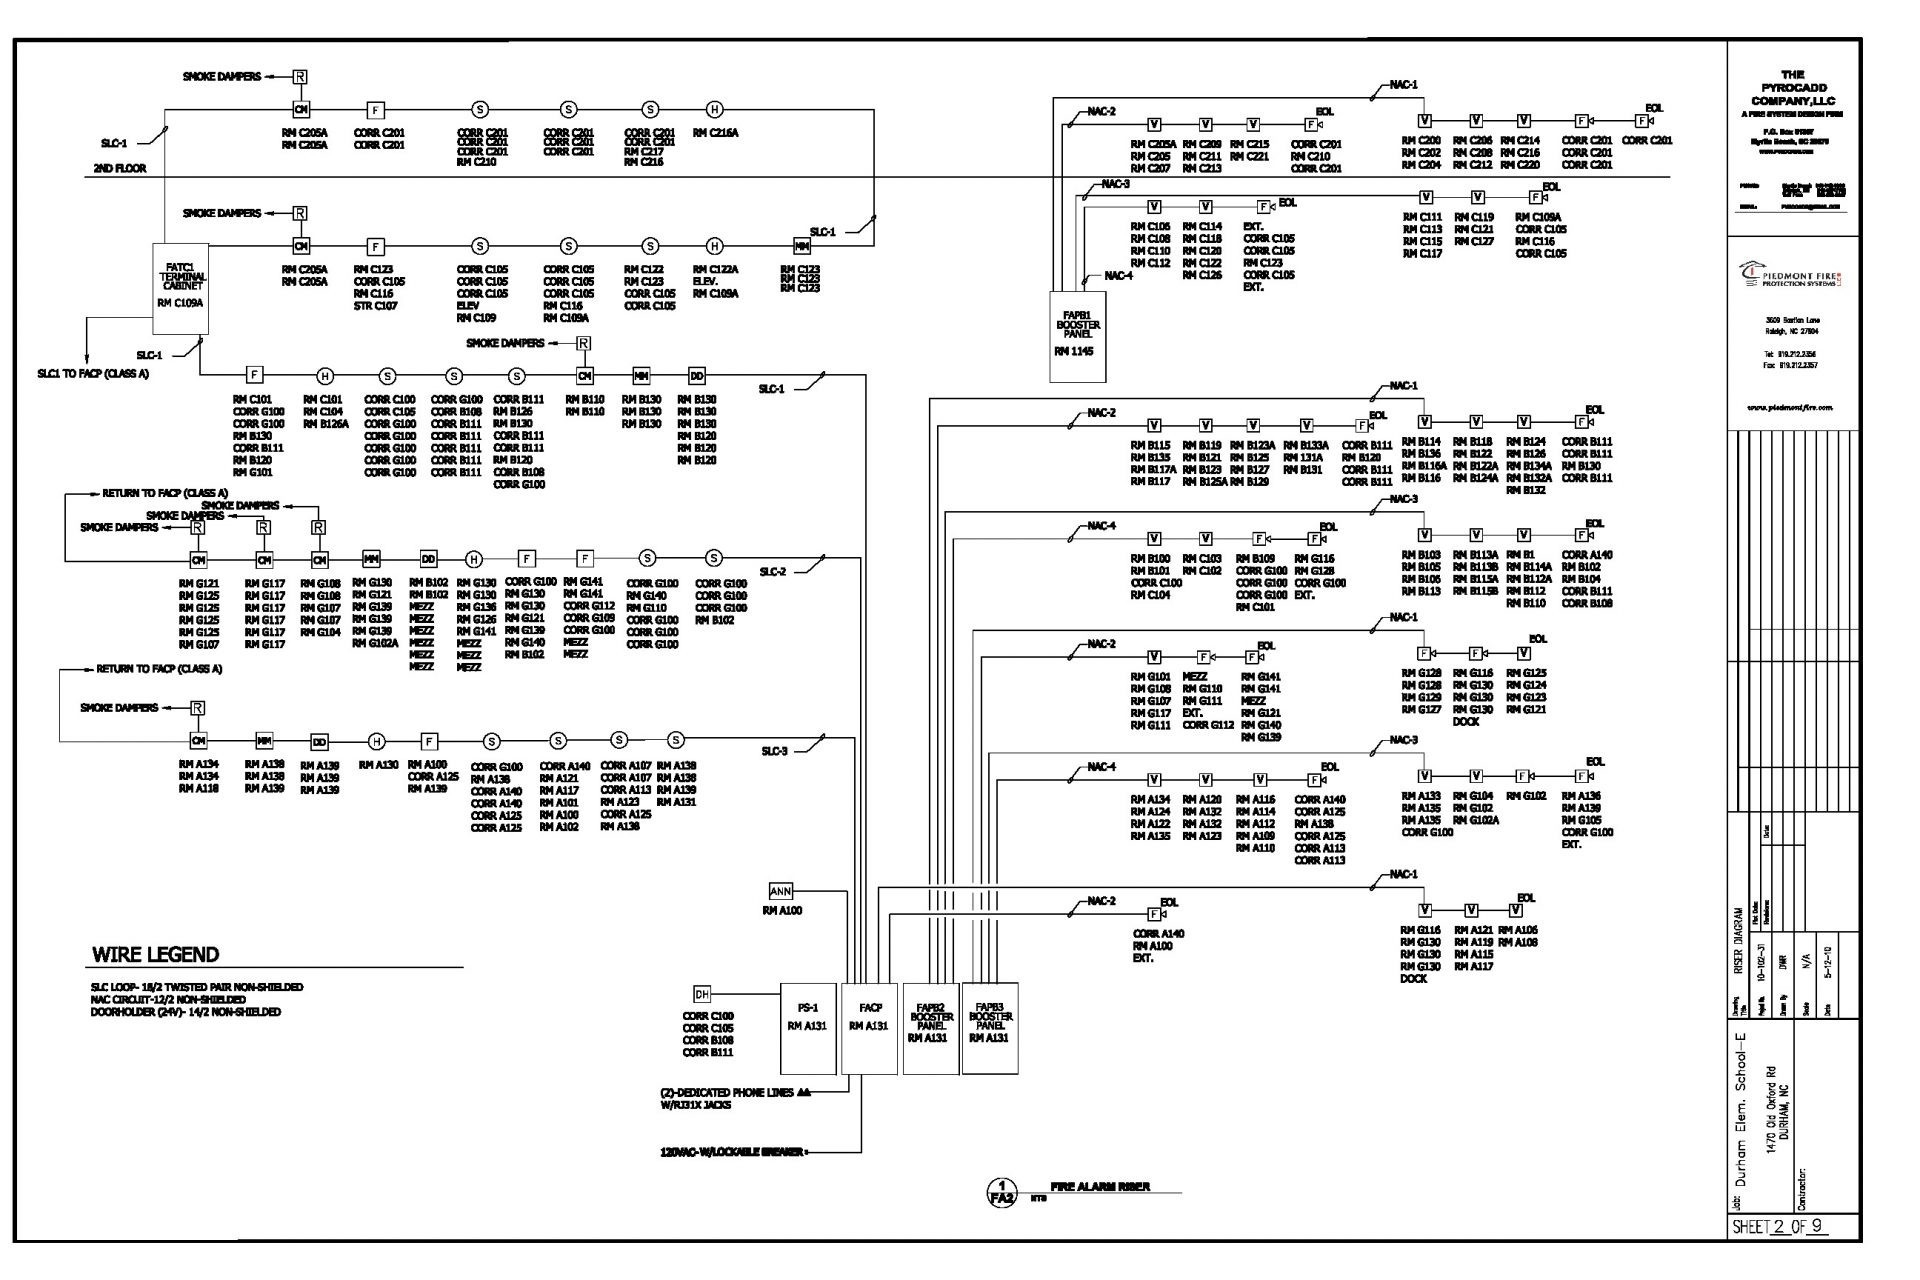 Wiring Diagram For Fire Alarm Pulls Wiring Diagram Gp